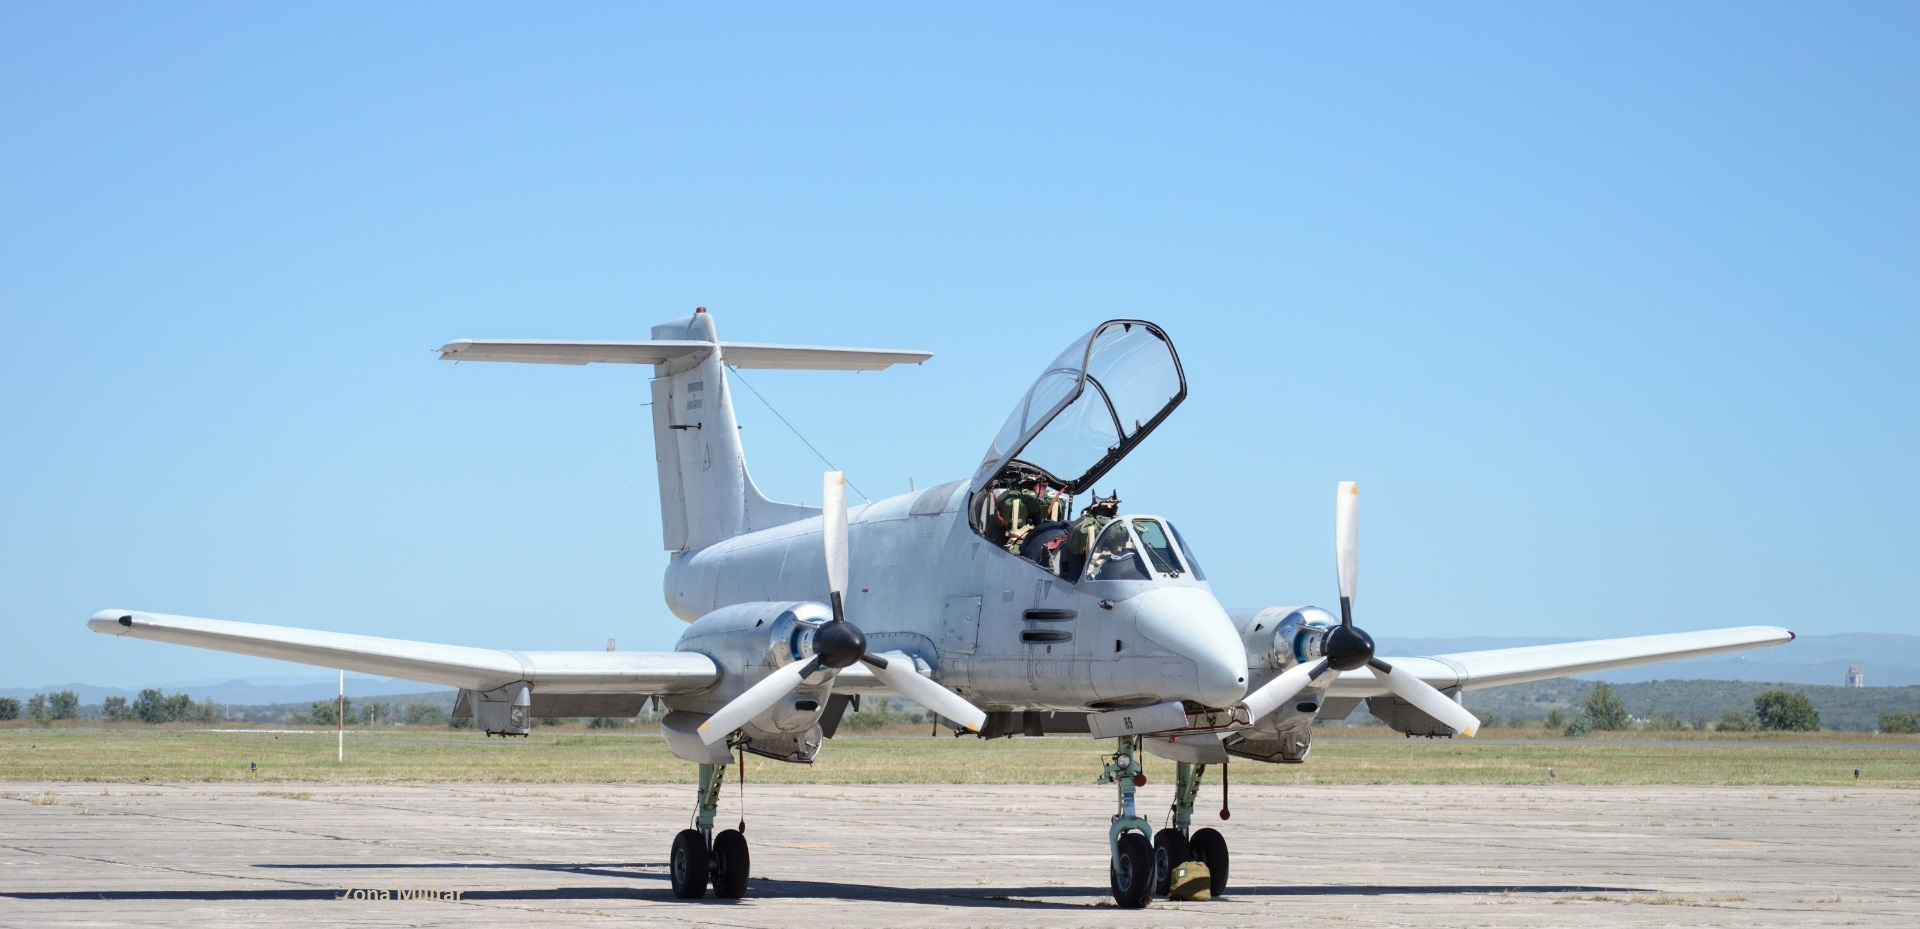 Argentina - Página 8 IA-58-Pucara-EAM-7